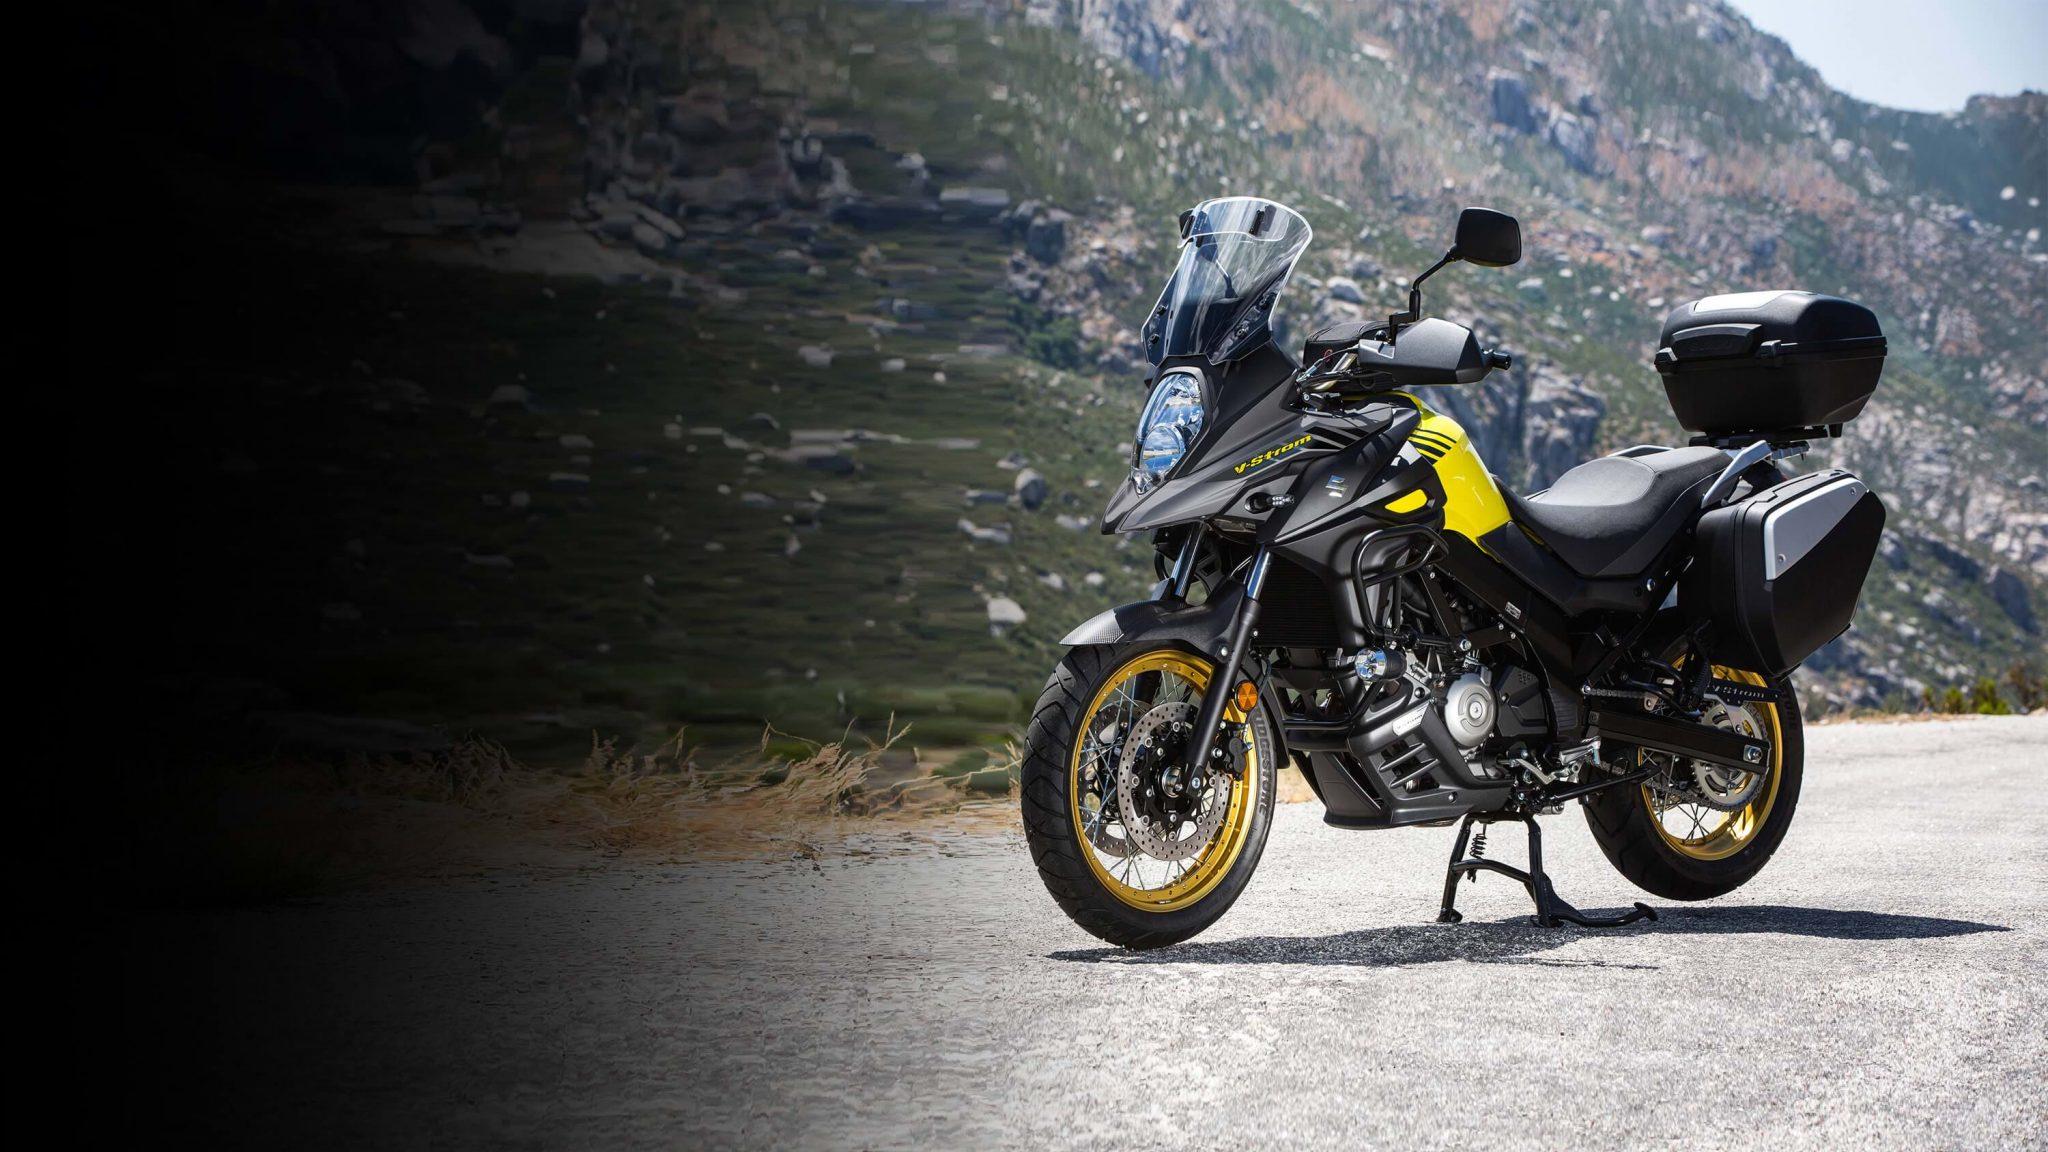 2018 Suzuki V-Strom 650XT touring motorbike parked